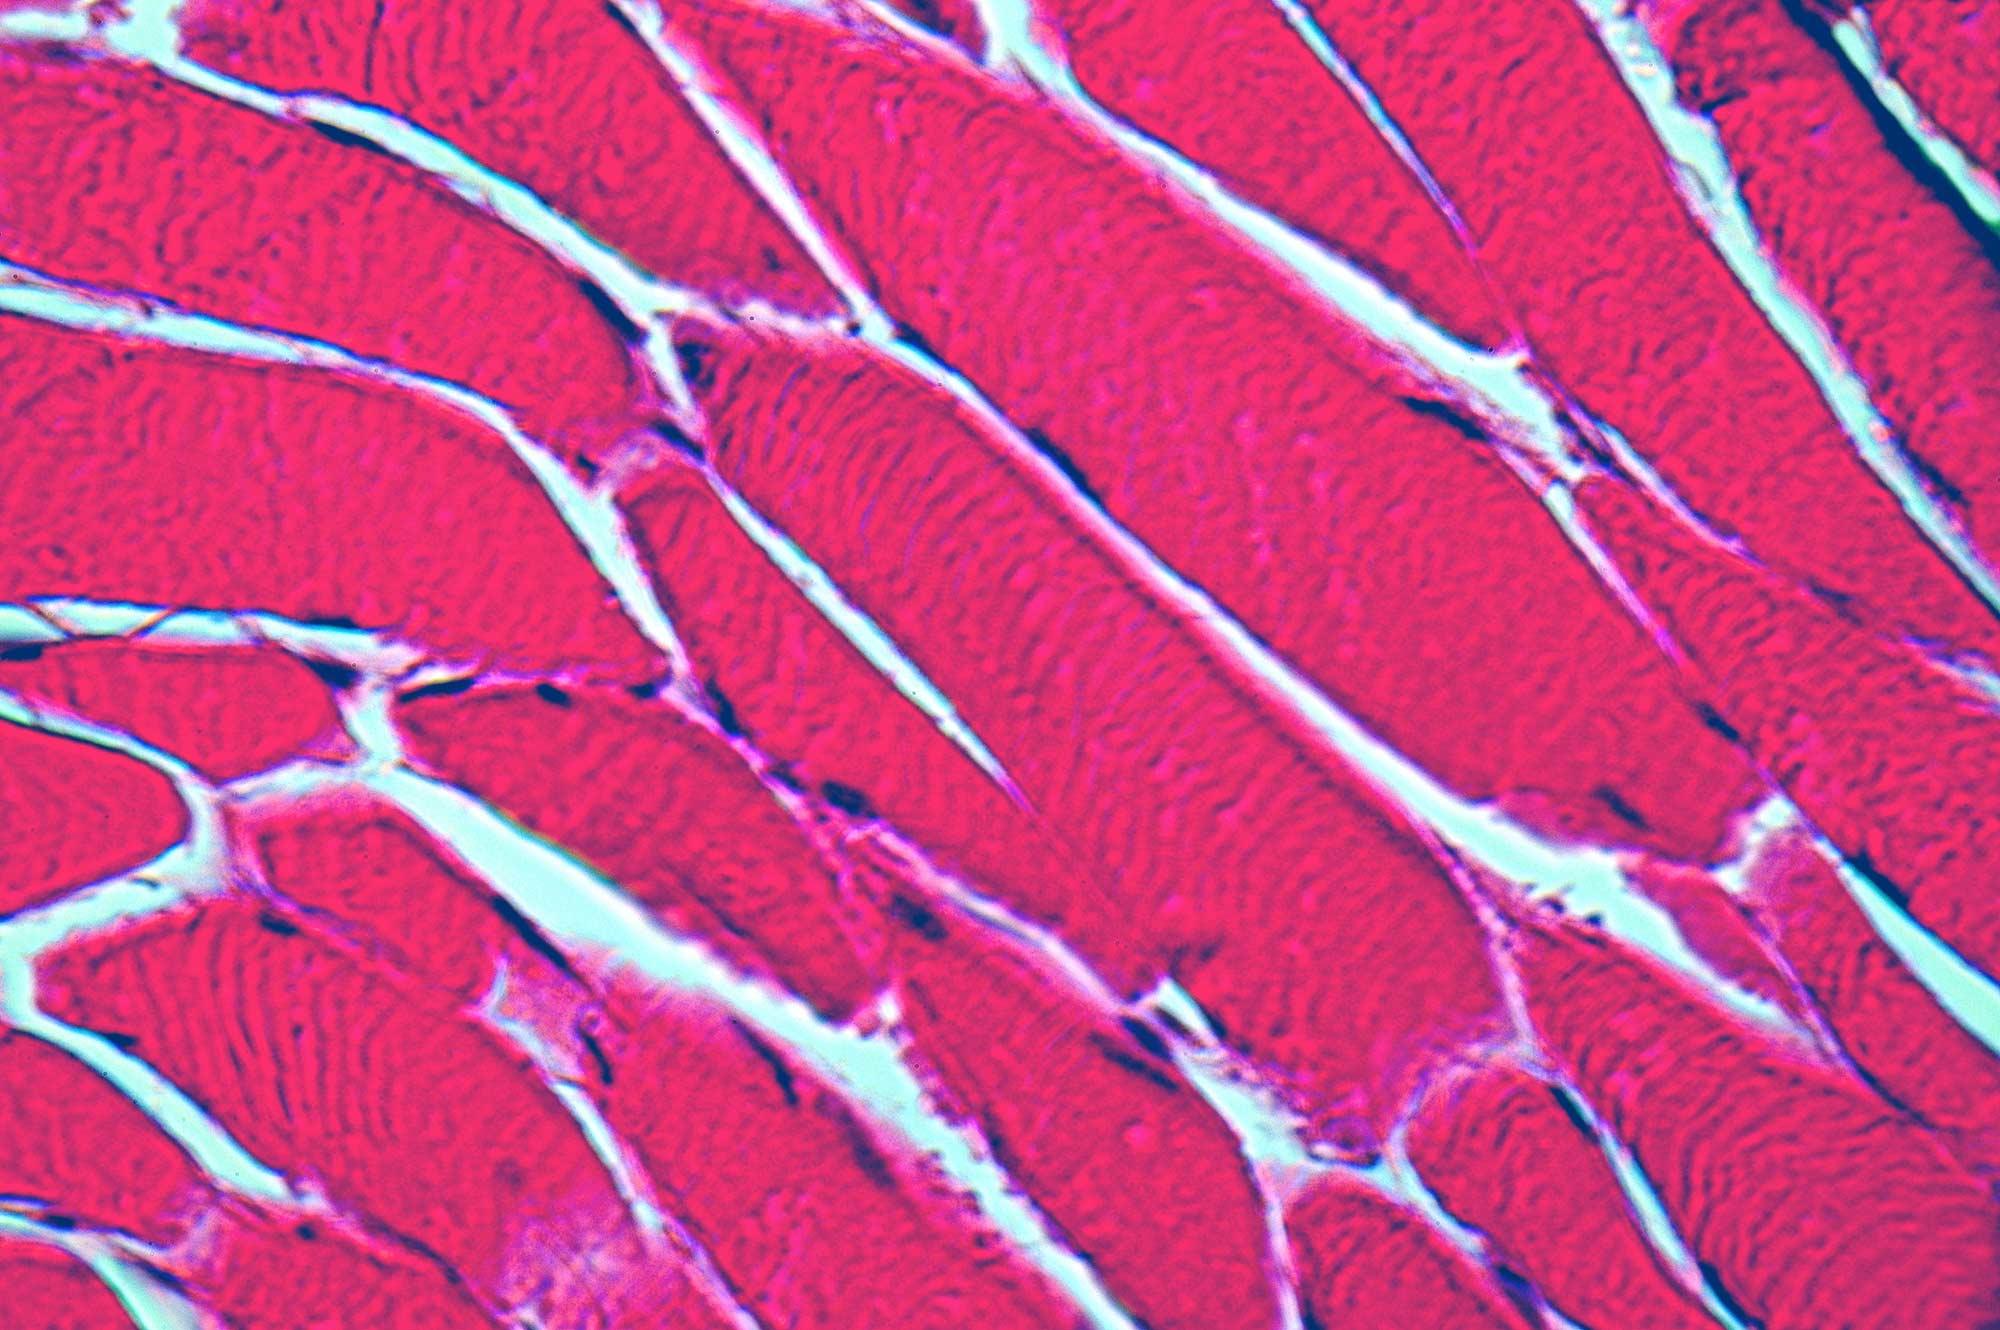 uva  partners   bold goal manufacturing human tissue uva today